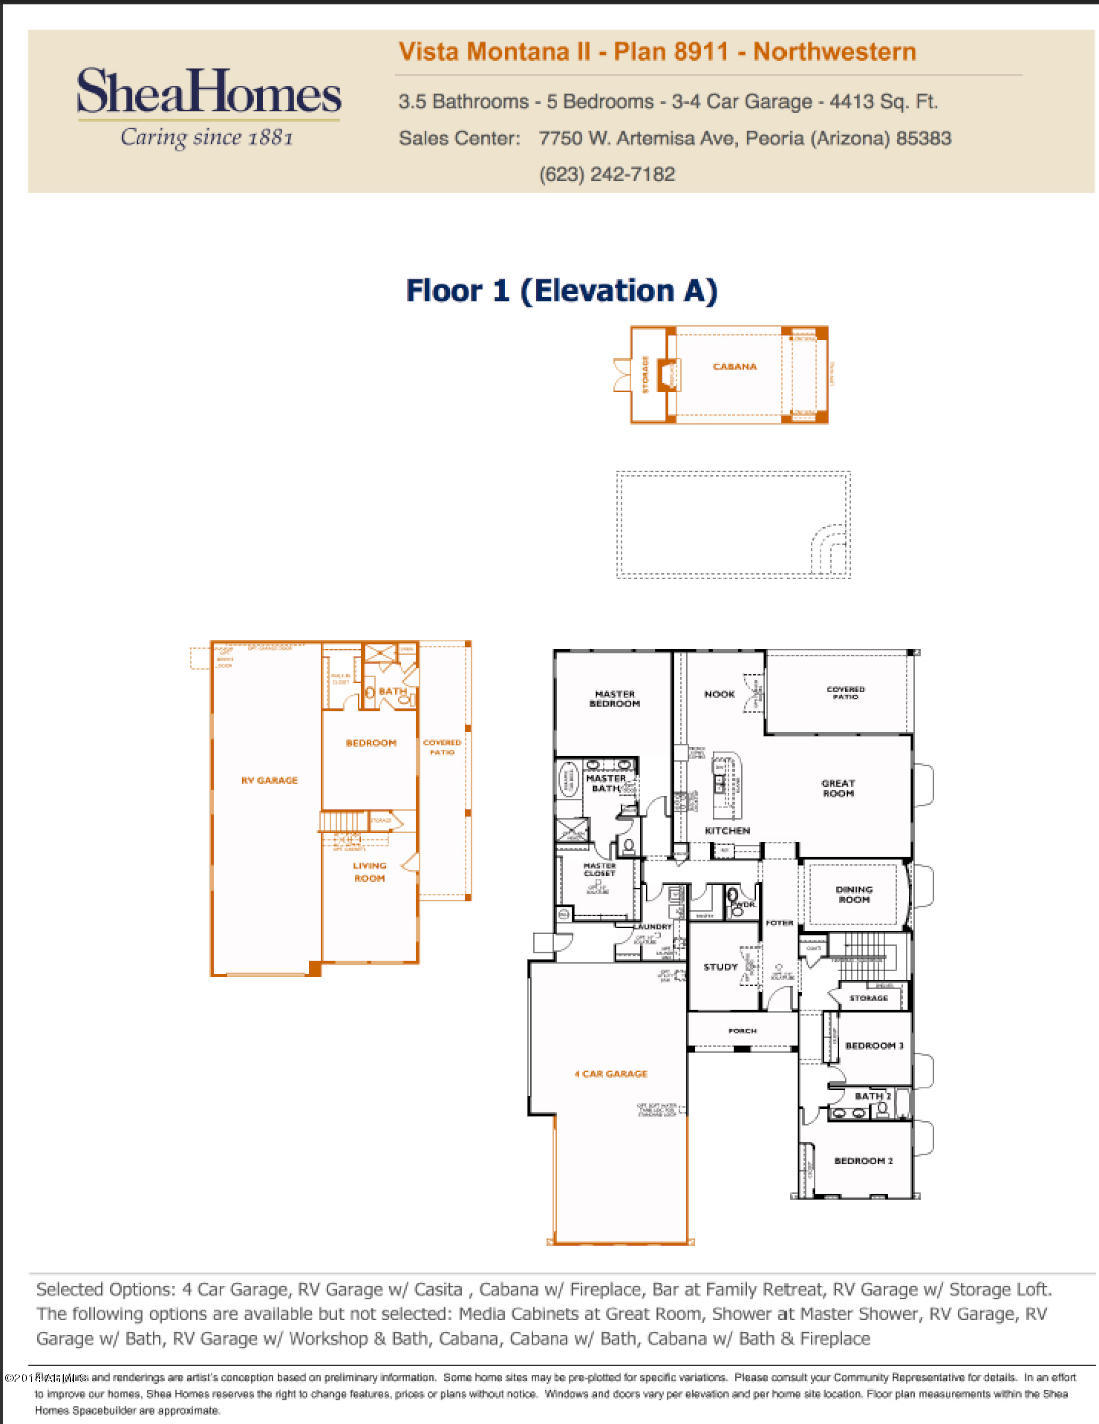 7708 W CHAMA Drive, Peoria, AZ 85383 (MLS# 5096406 ... Shea Homes Floor Plans Bed Bath on 3 bed 3 bath floor plans, 5 bed 3 bath floor plans, 6 bed 3 bath floor plans, 2 bed 1 bath floor plans, bathroom floor plans, 4 bedroom home floor plans,